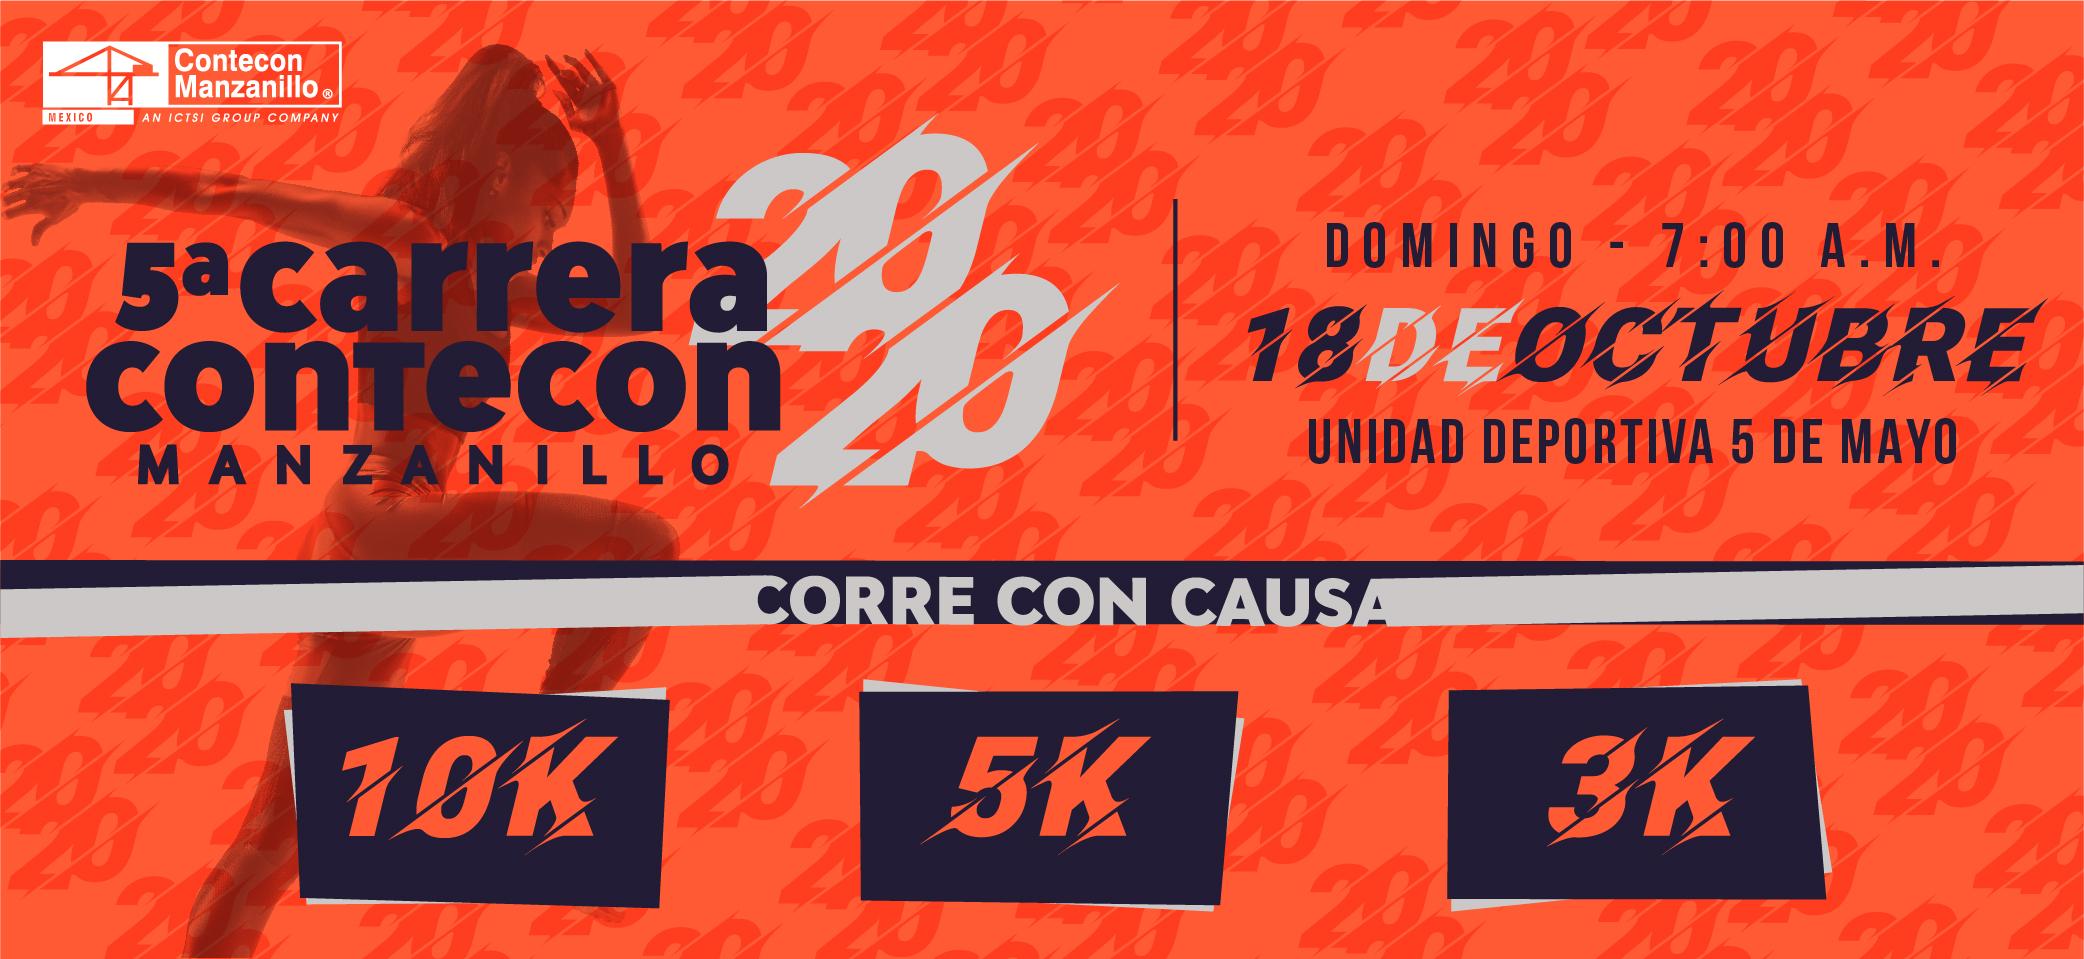 5ª Carrera CONTECON 2020